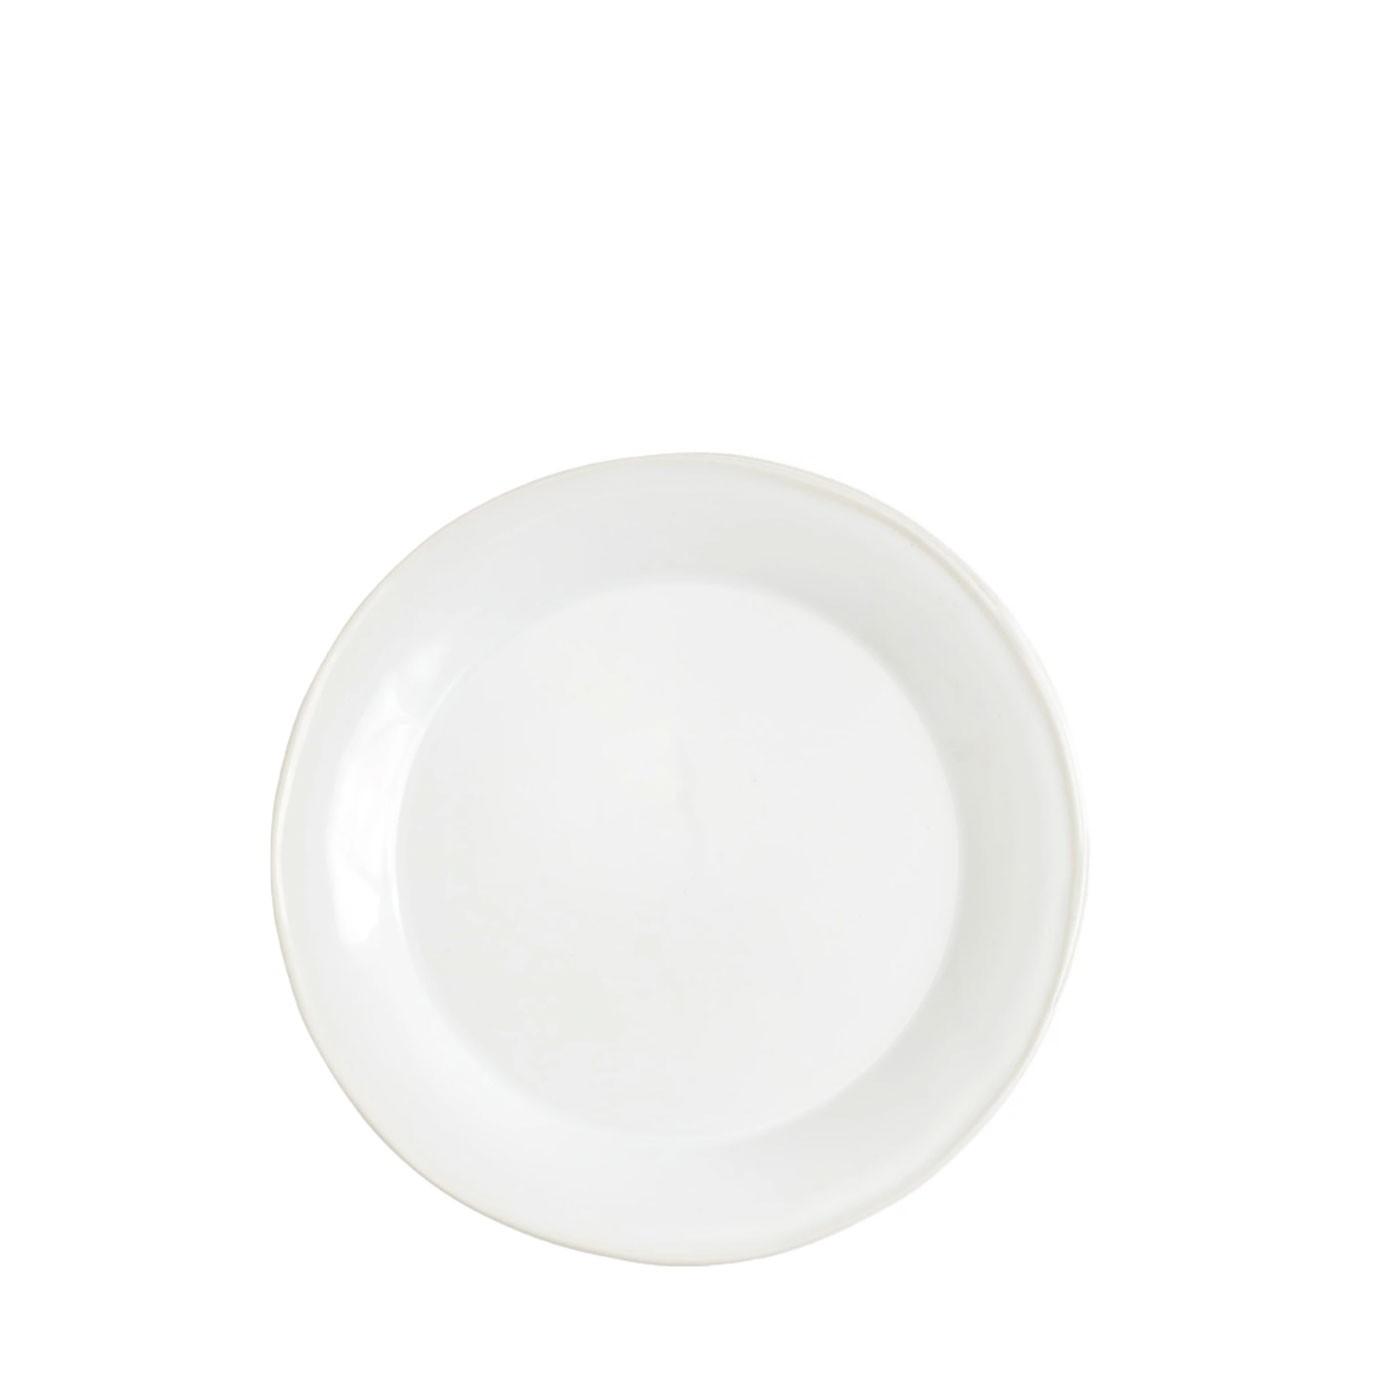 Chroma White Dinner Plate - Vietri   Eataly.com